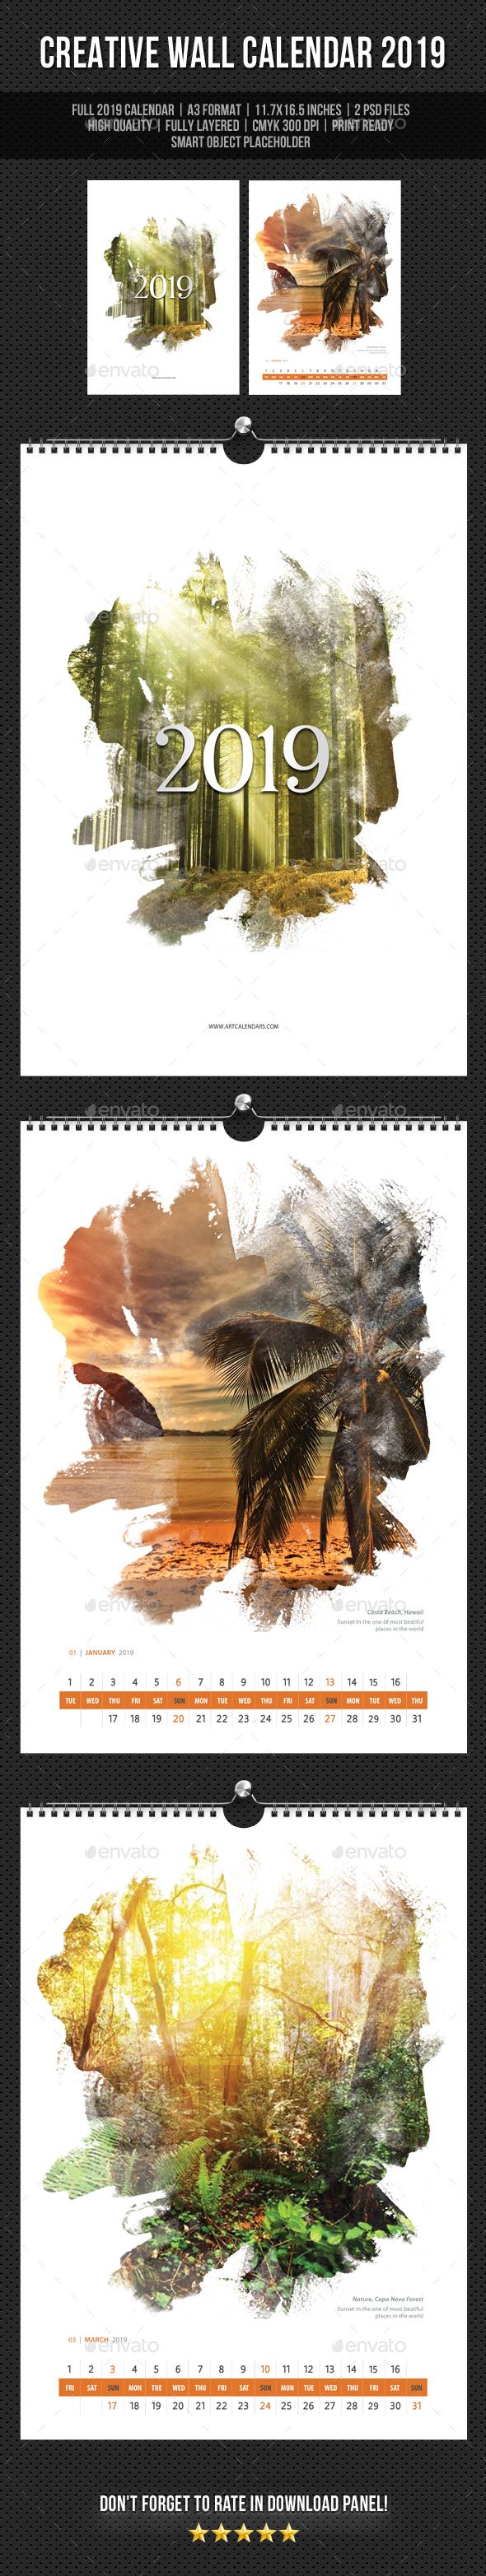 Creative Wall Calendar 2019 V15 - Calendars Stationery